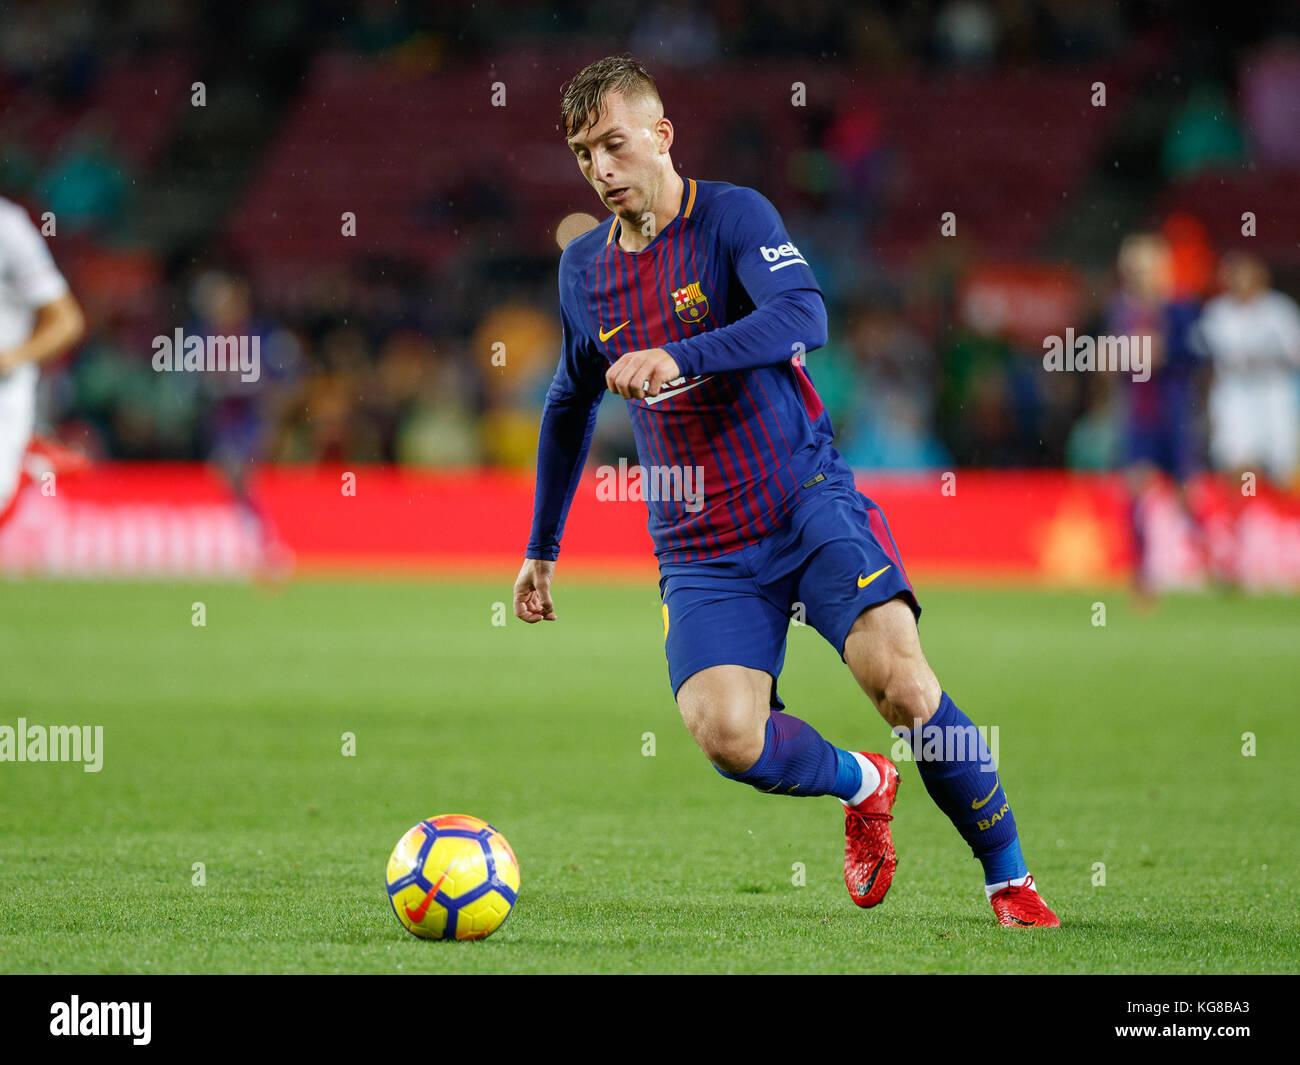 Barcelona, Spain. 4th November, 2017. Match between FC Barcelona and Sevilla FC in Camp Nou stadium. Deulofeu Credit: - Stock Image